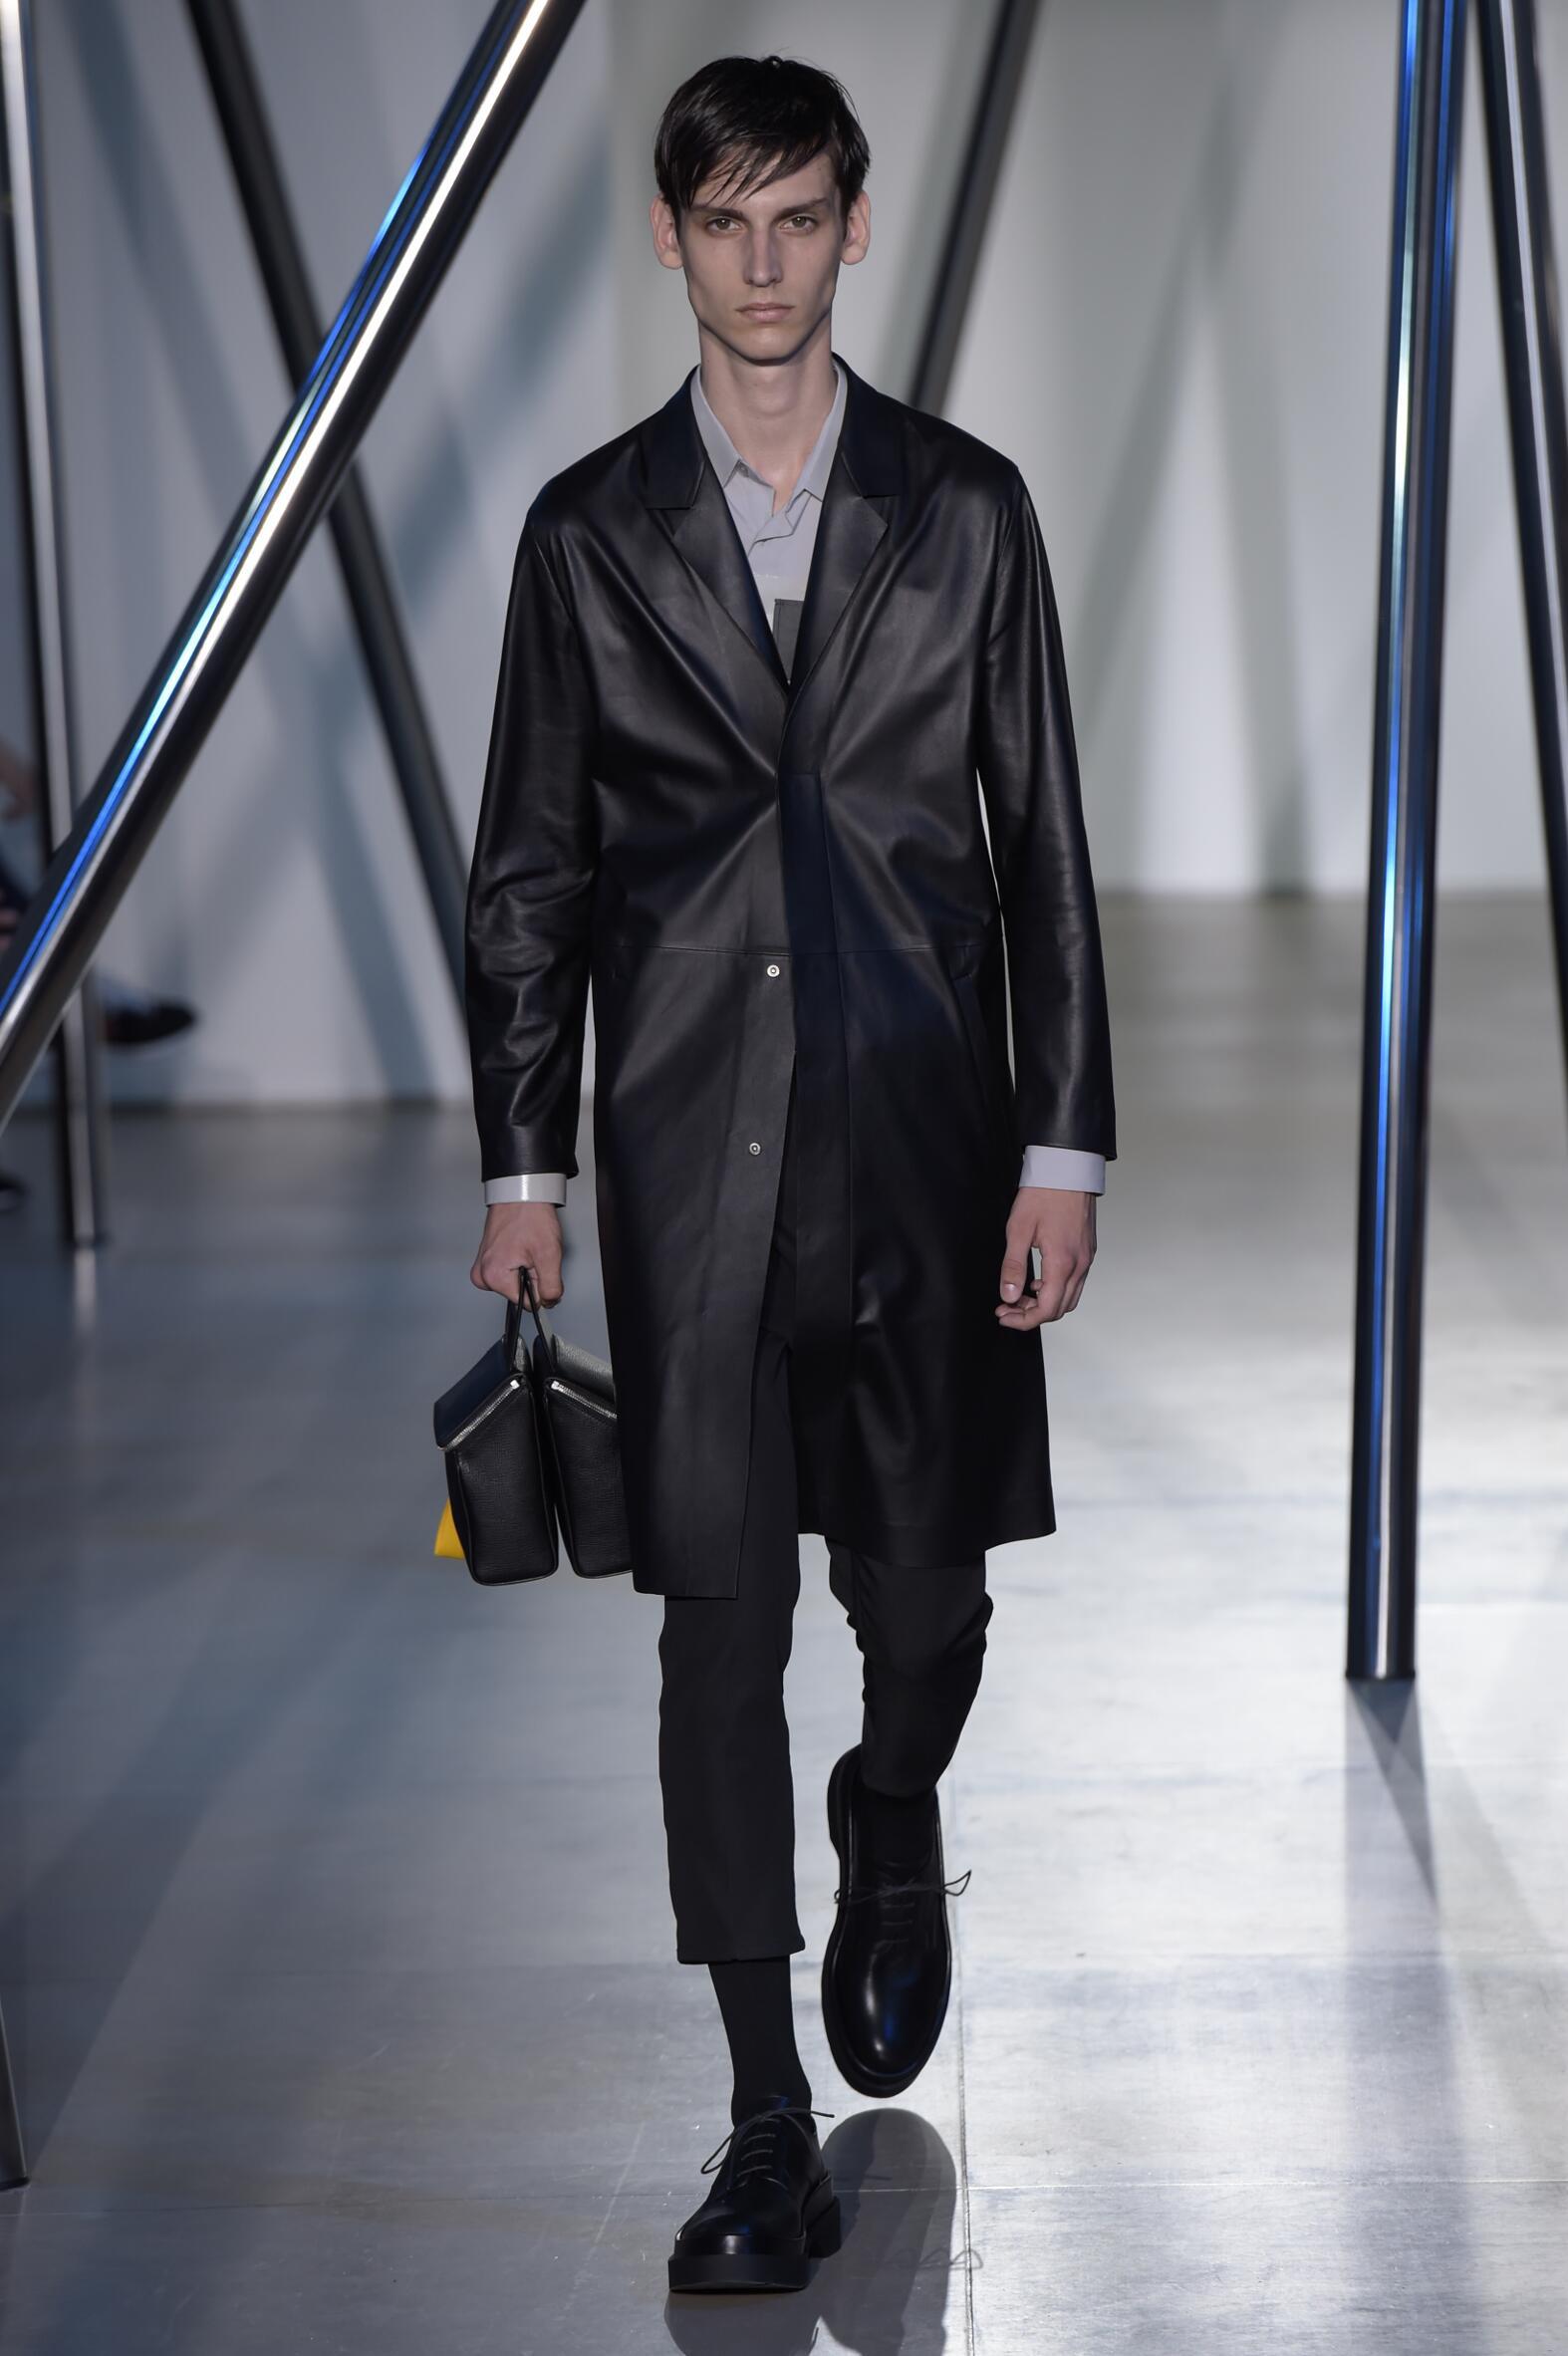 Catwalk Jil Sander Menswear Collection Summer 2016